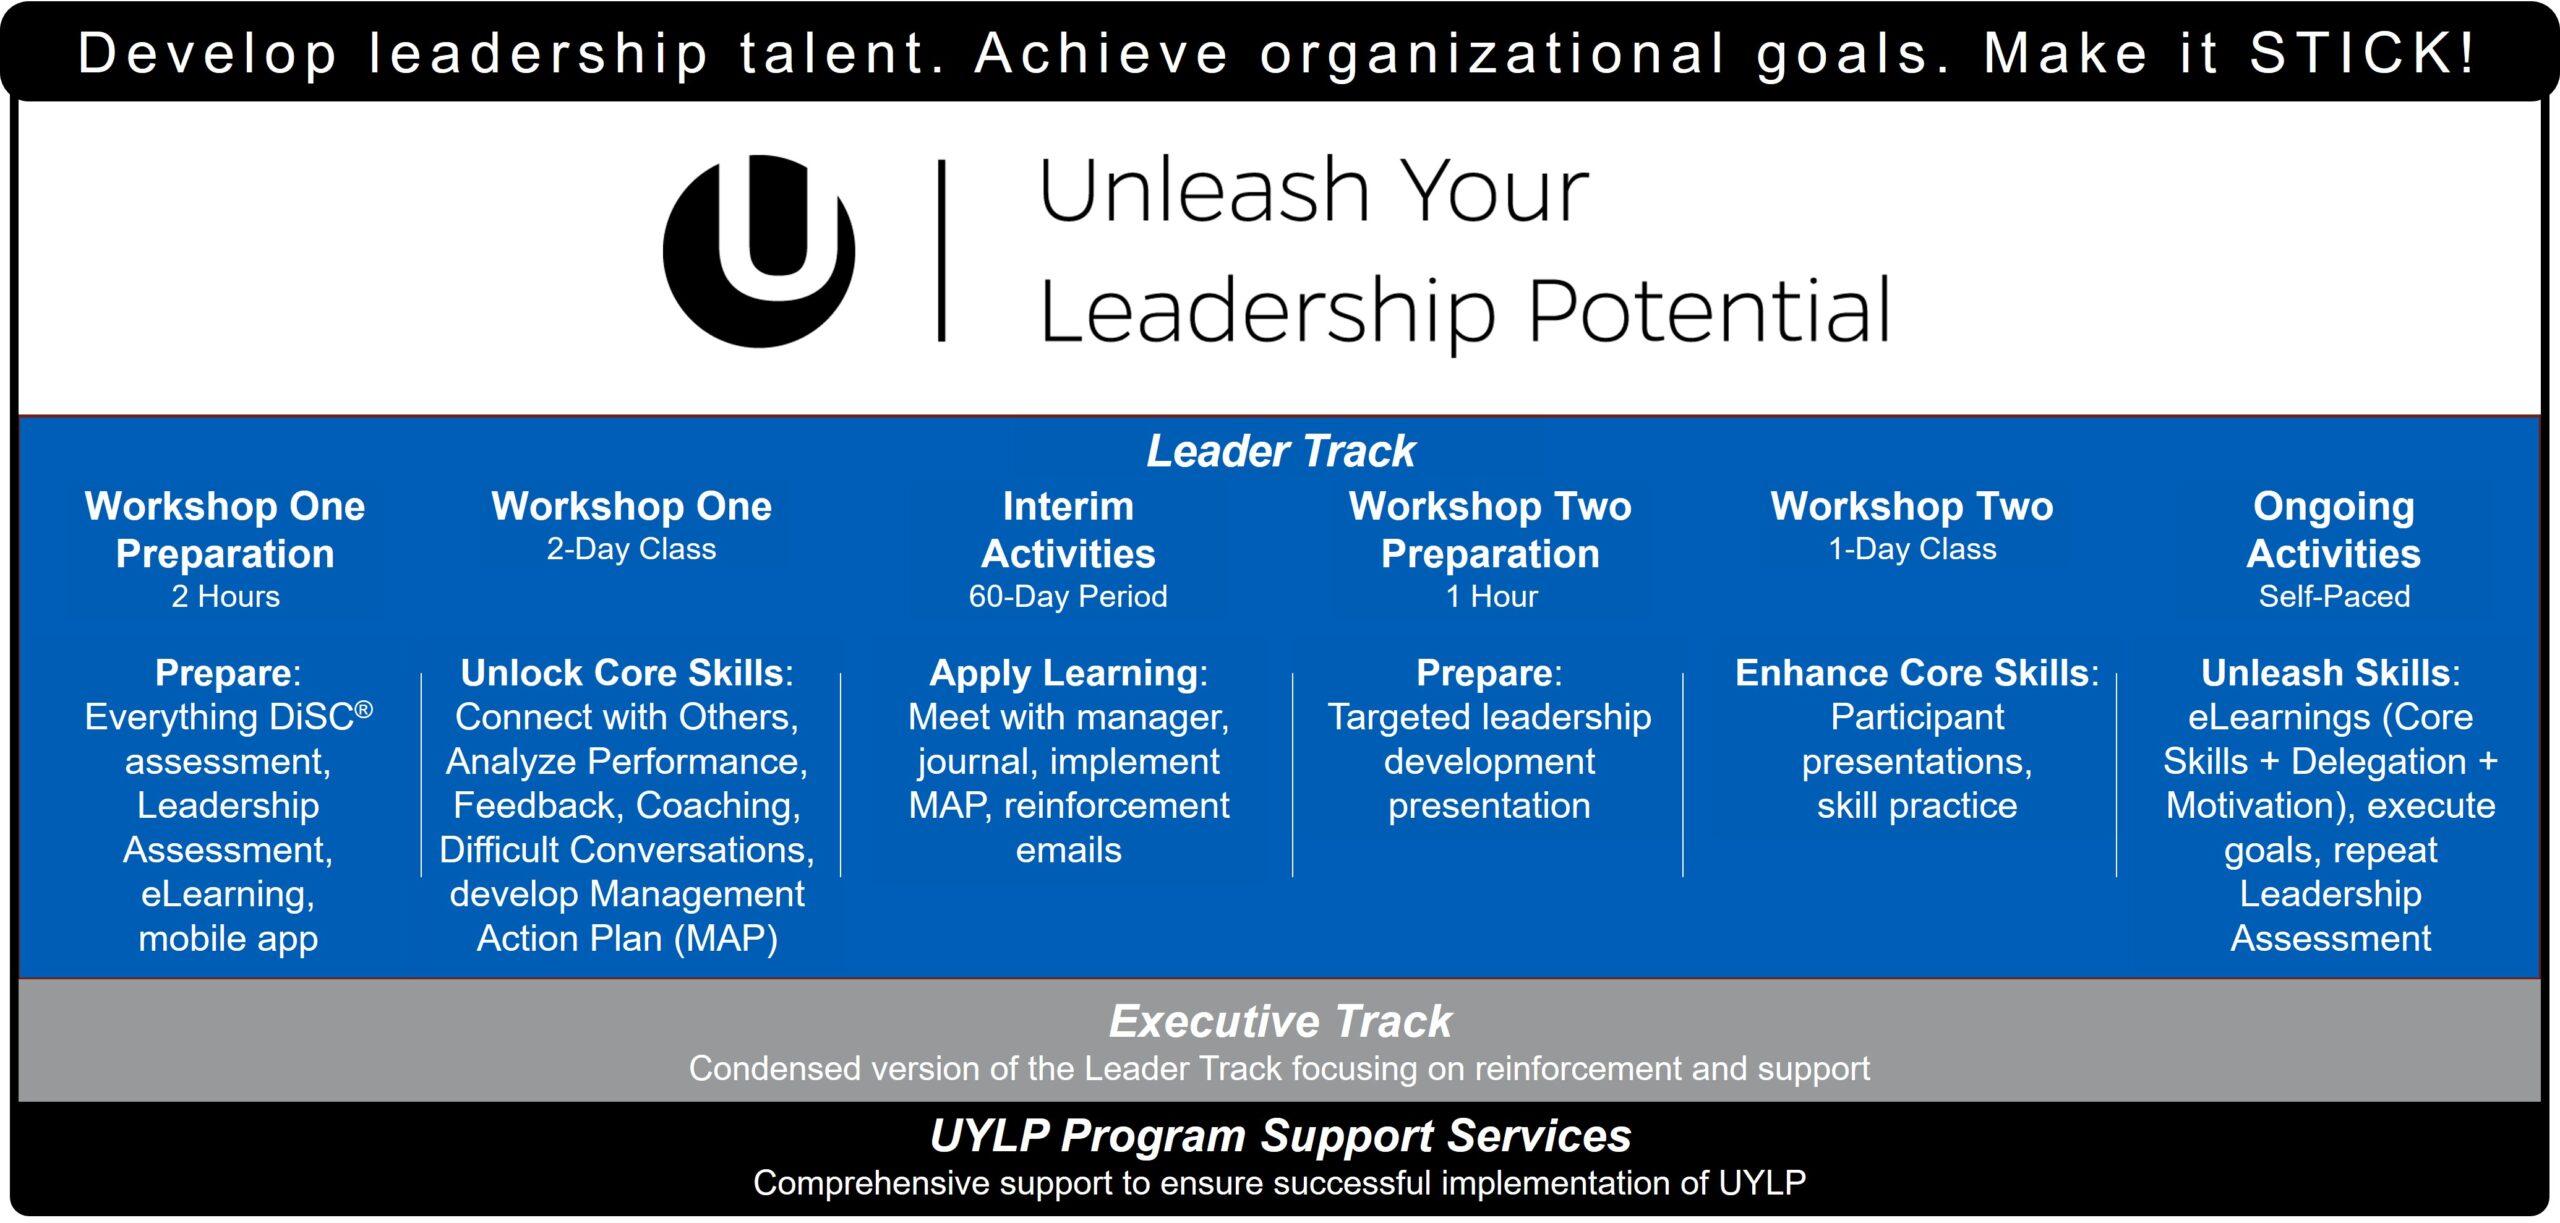 UYLP_Program_Graphic_20210830